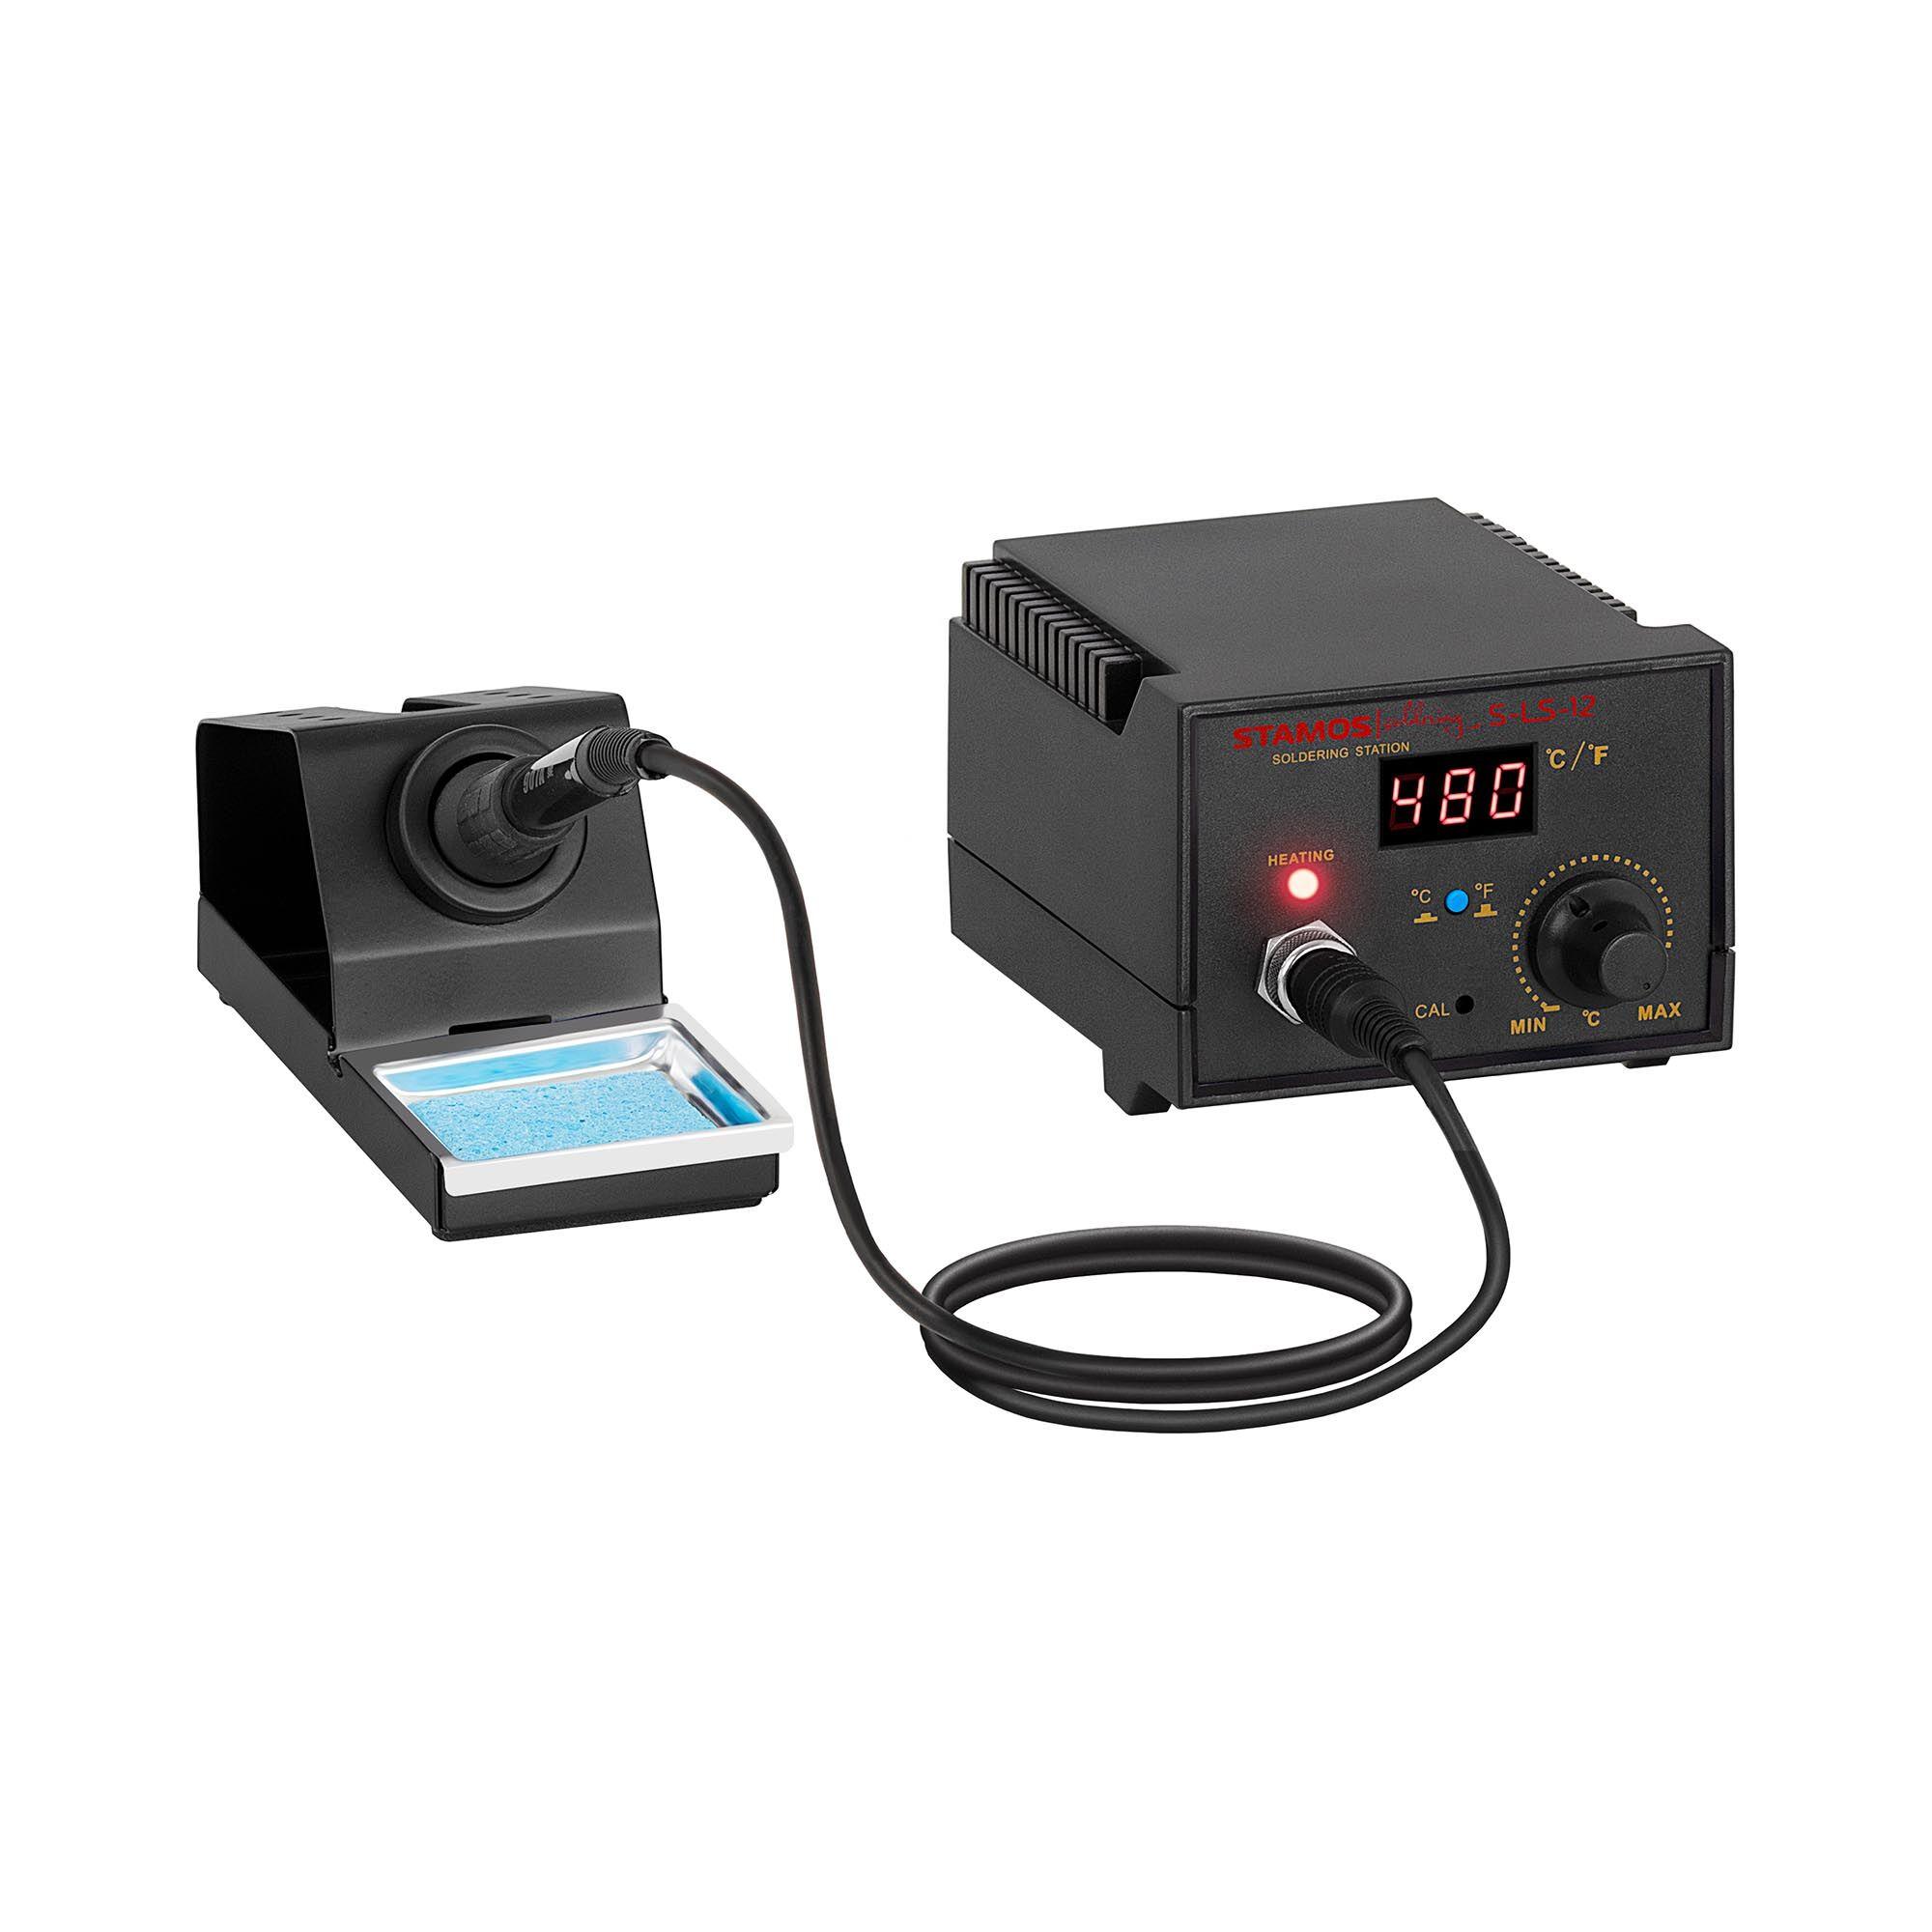 stamos soldering stazione saldante digitale - 65watt - led display- basic s-ls-12 basic